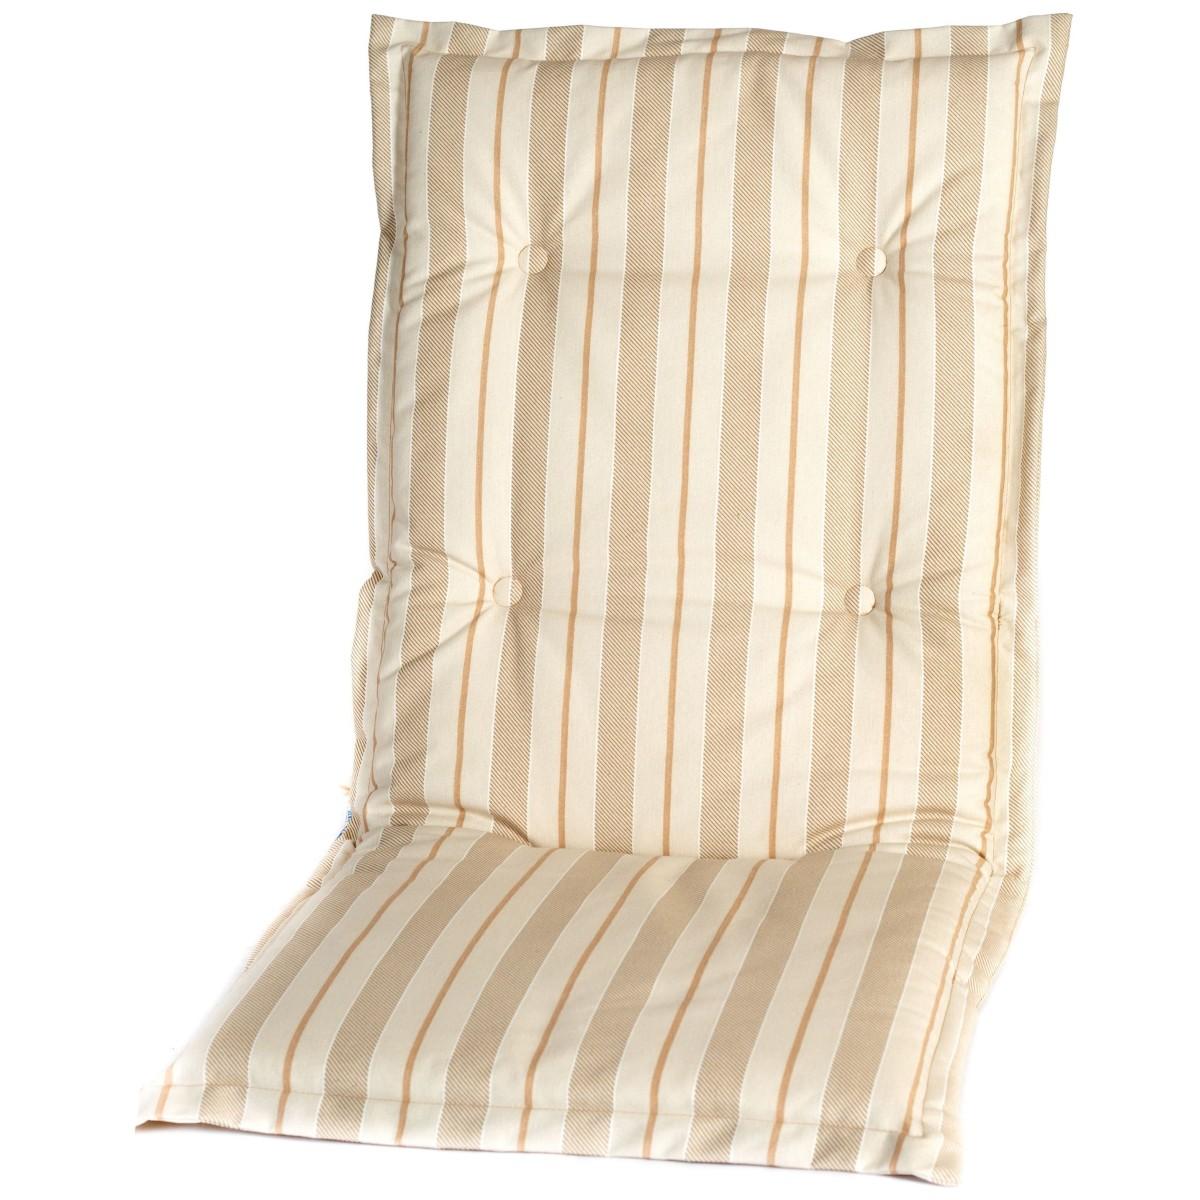 Подушка на кресло Ницца поликоттон бежевая полоска